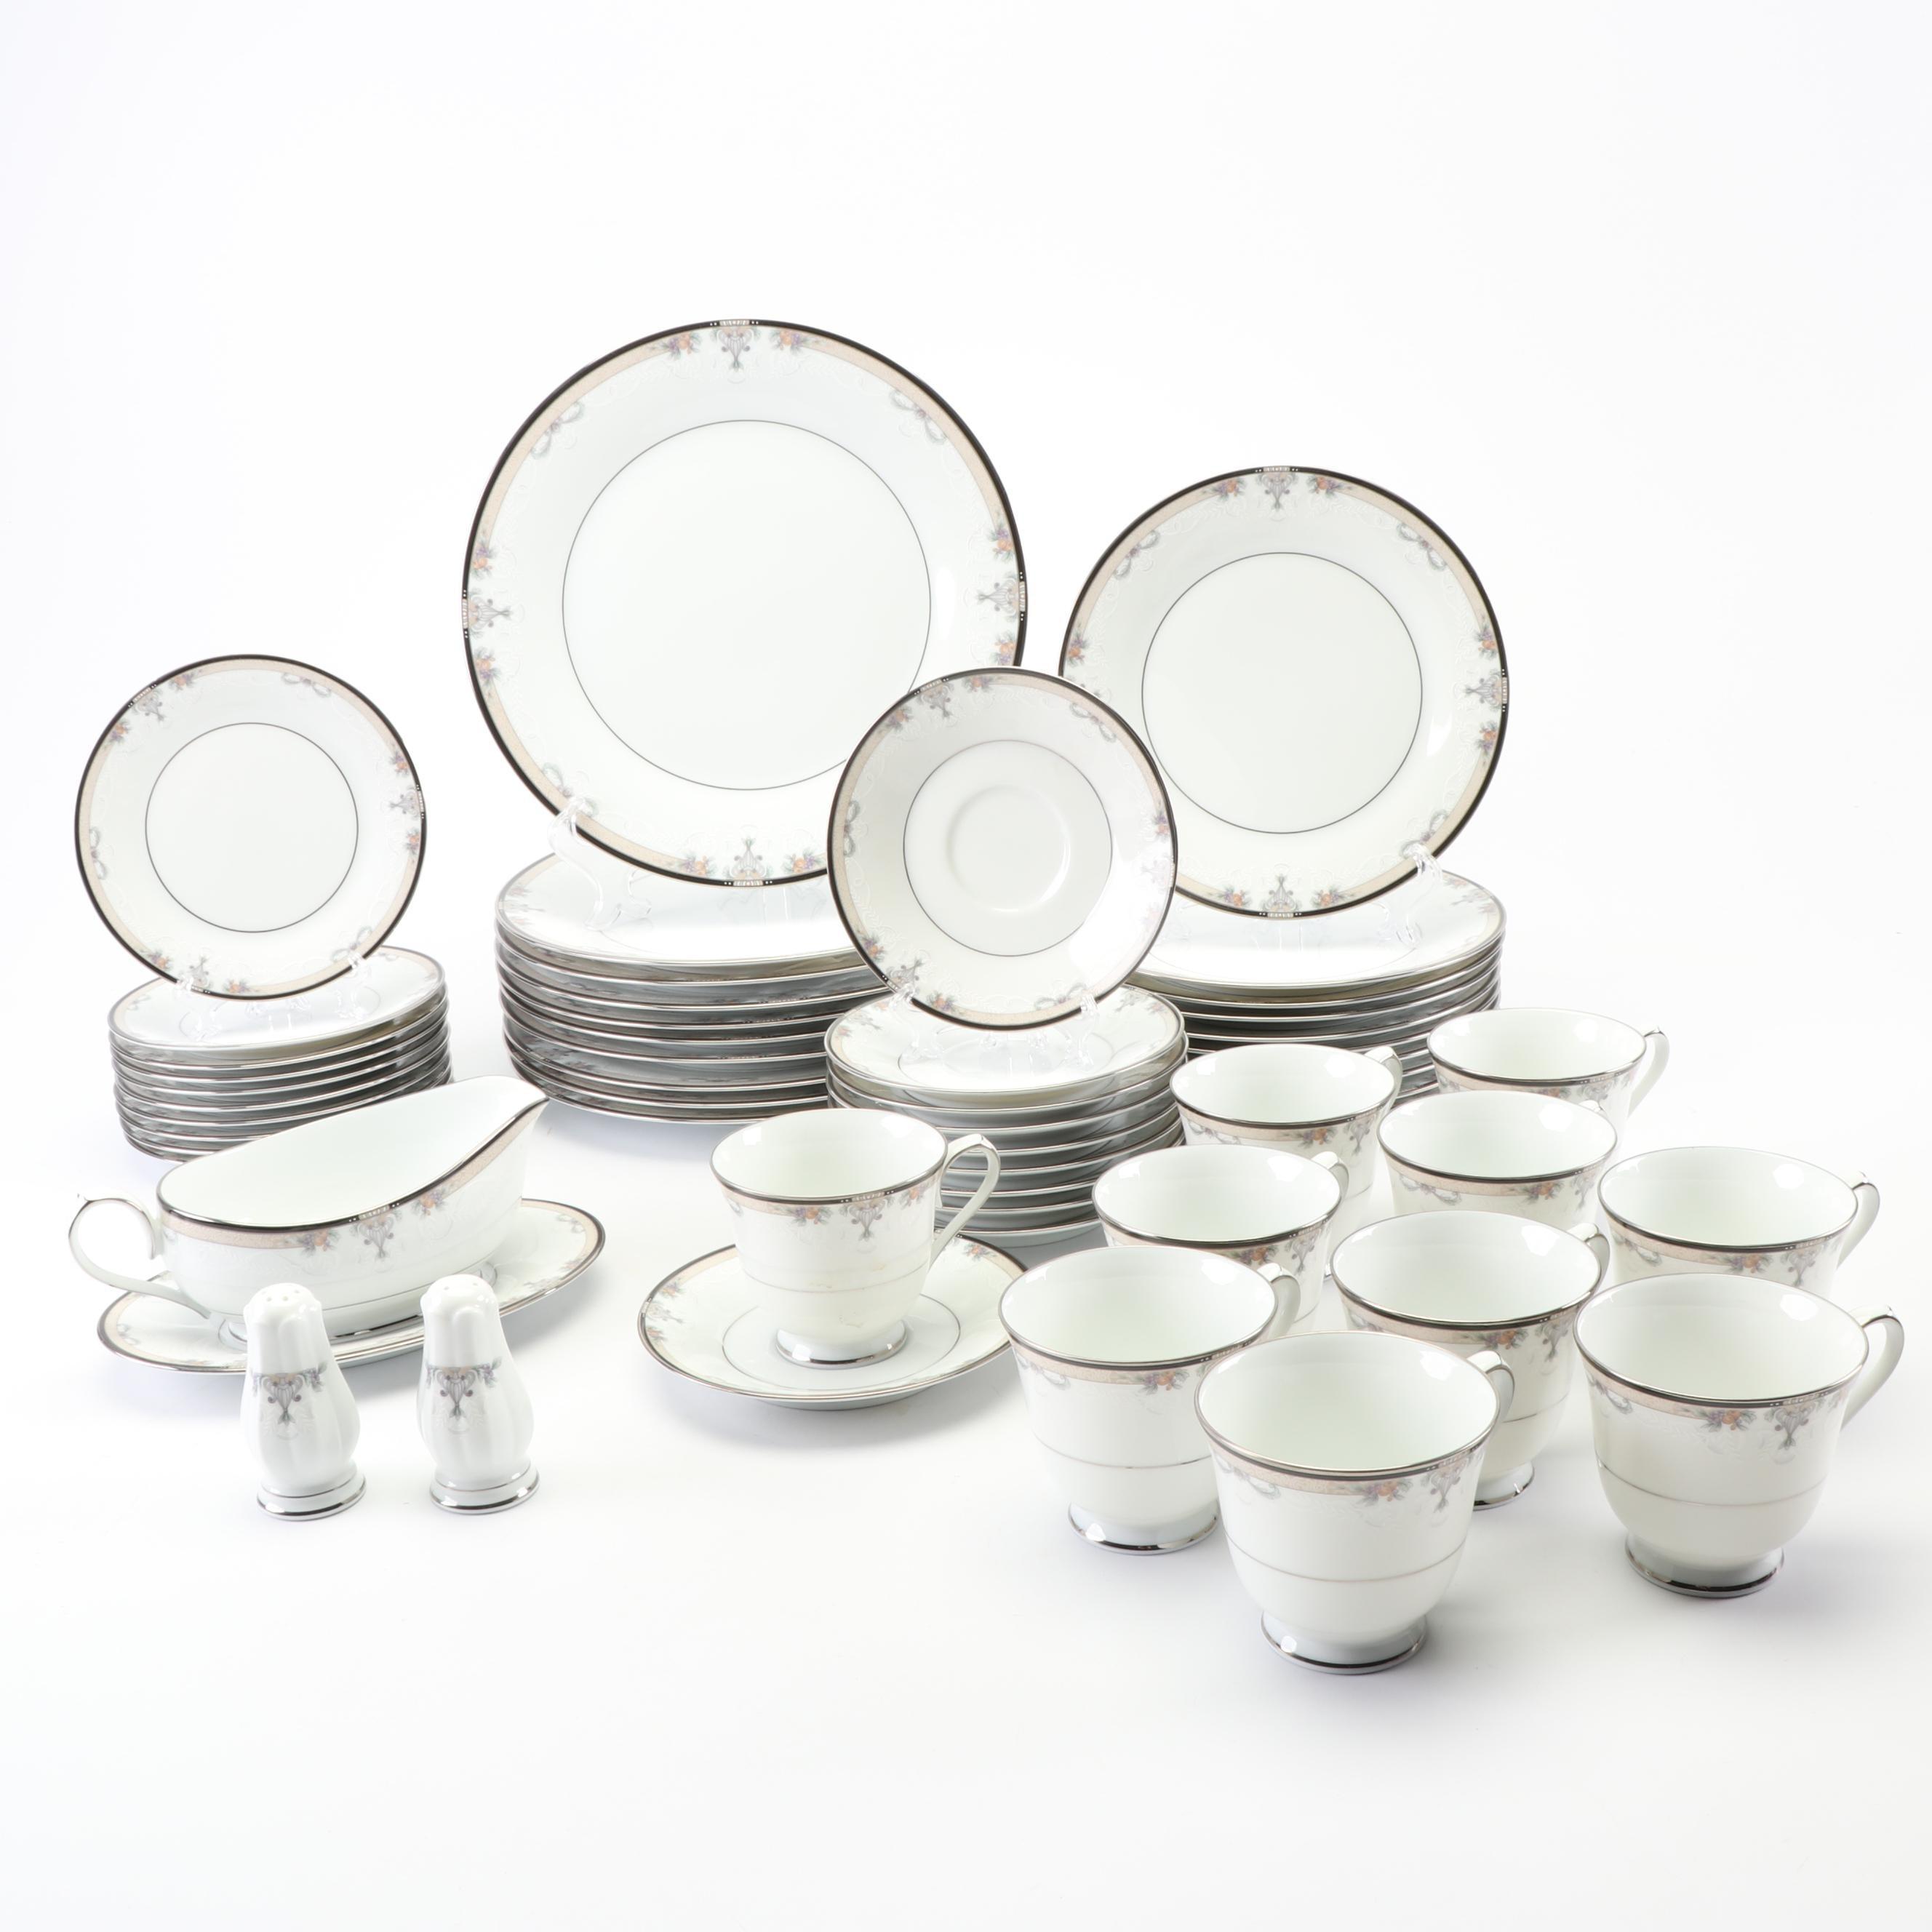 "Noritake ""Park Suite"" Porcelain Dinnerware c. 1991-99"